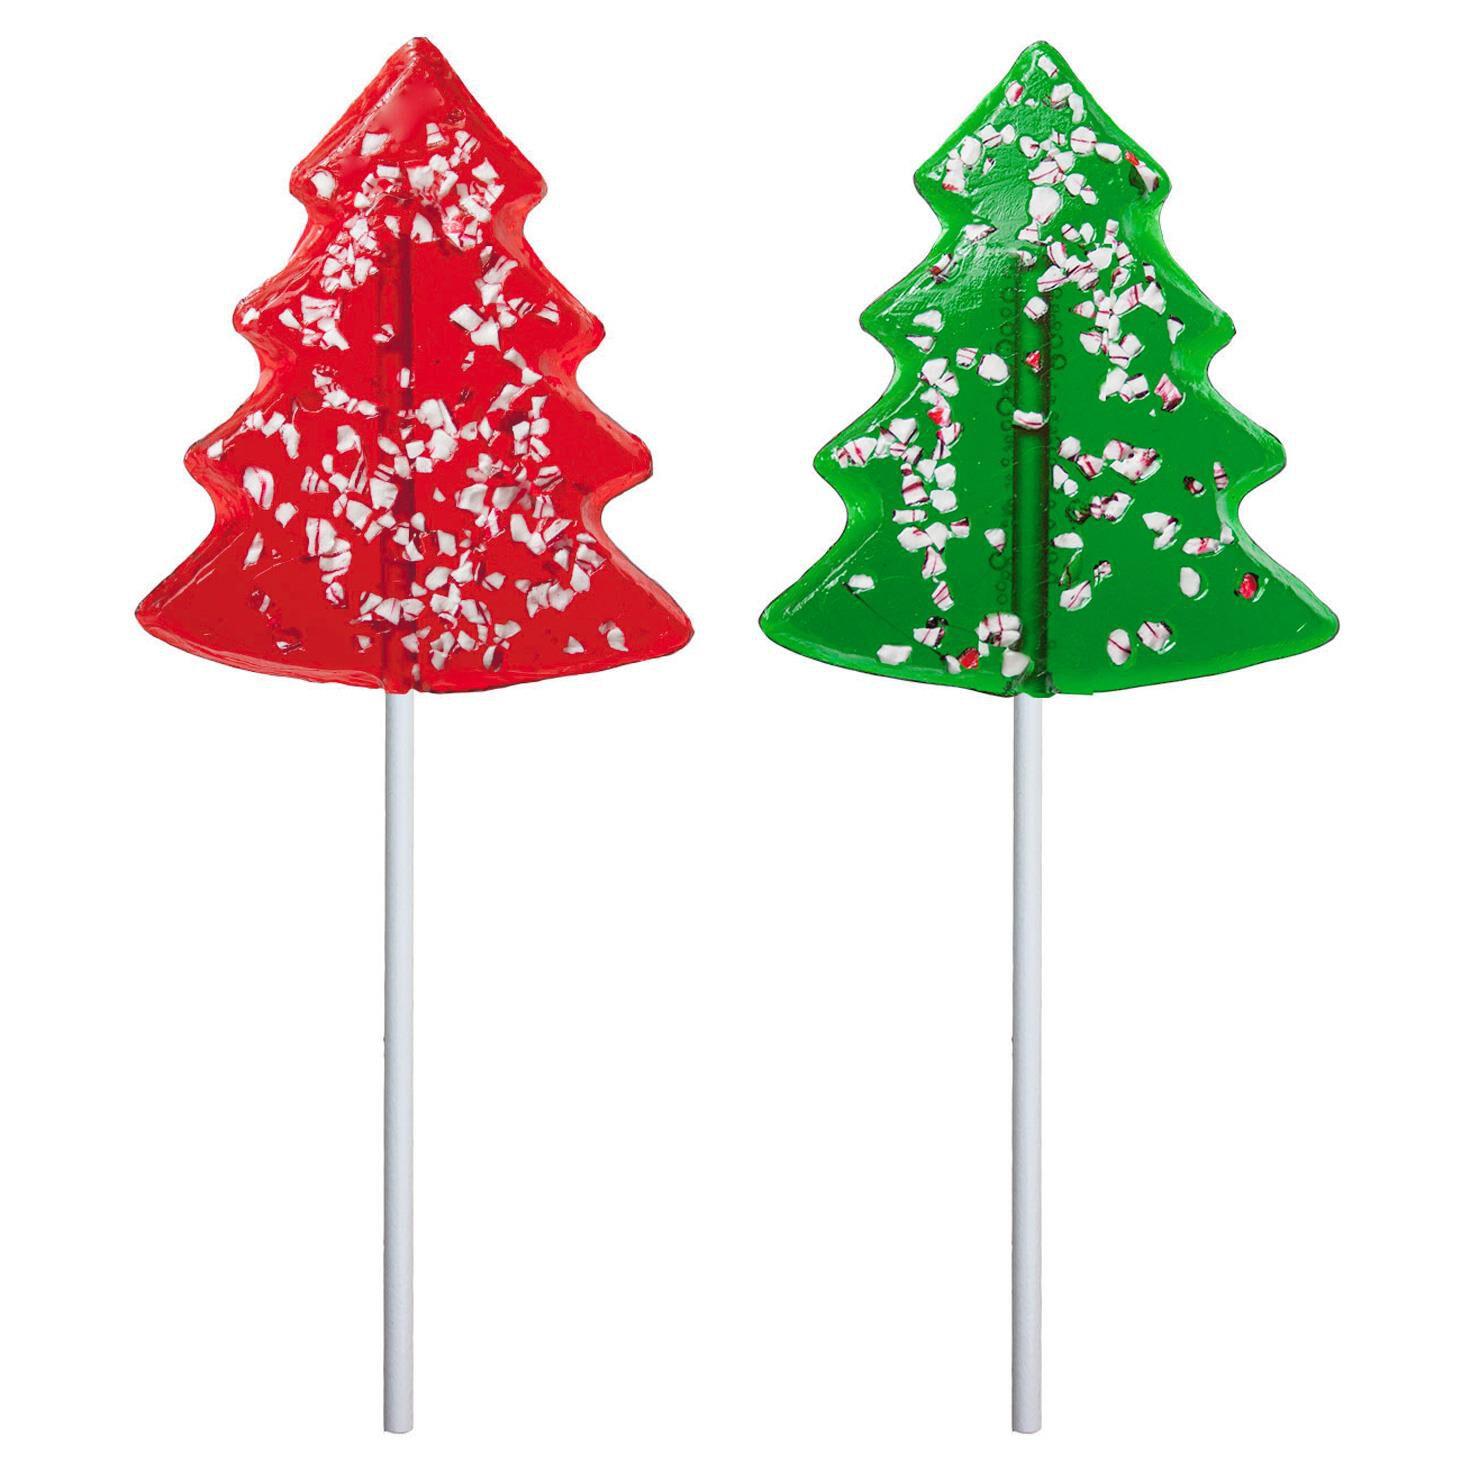 peppermint christmas tree candy lollipop 2 oz candy chocolate hallmark - Candy Christmas Tree